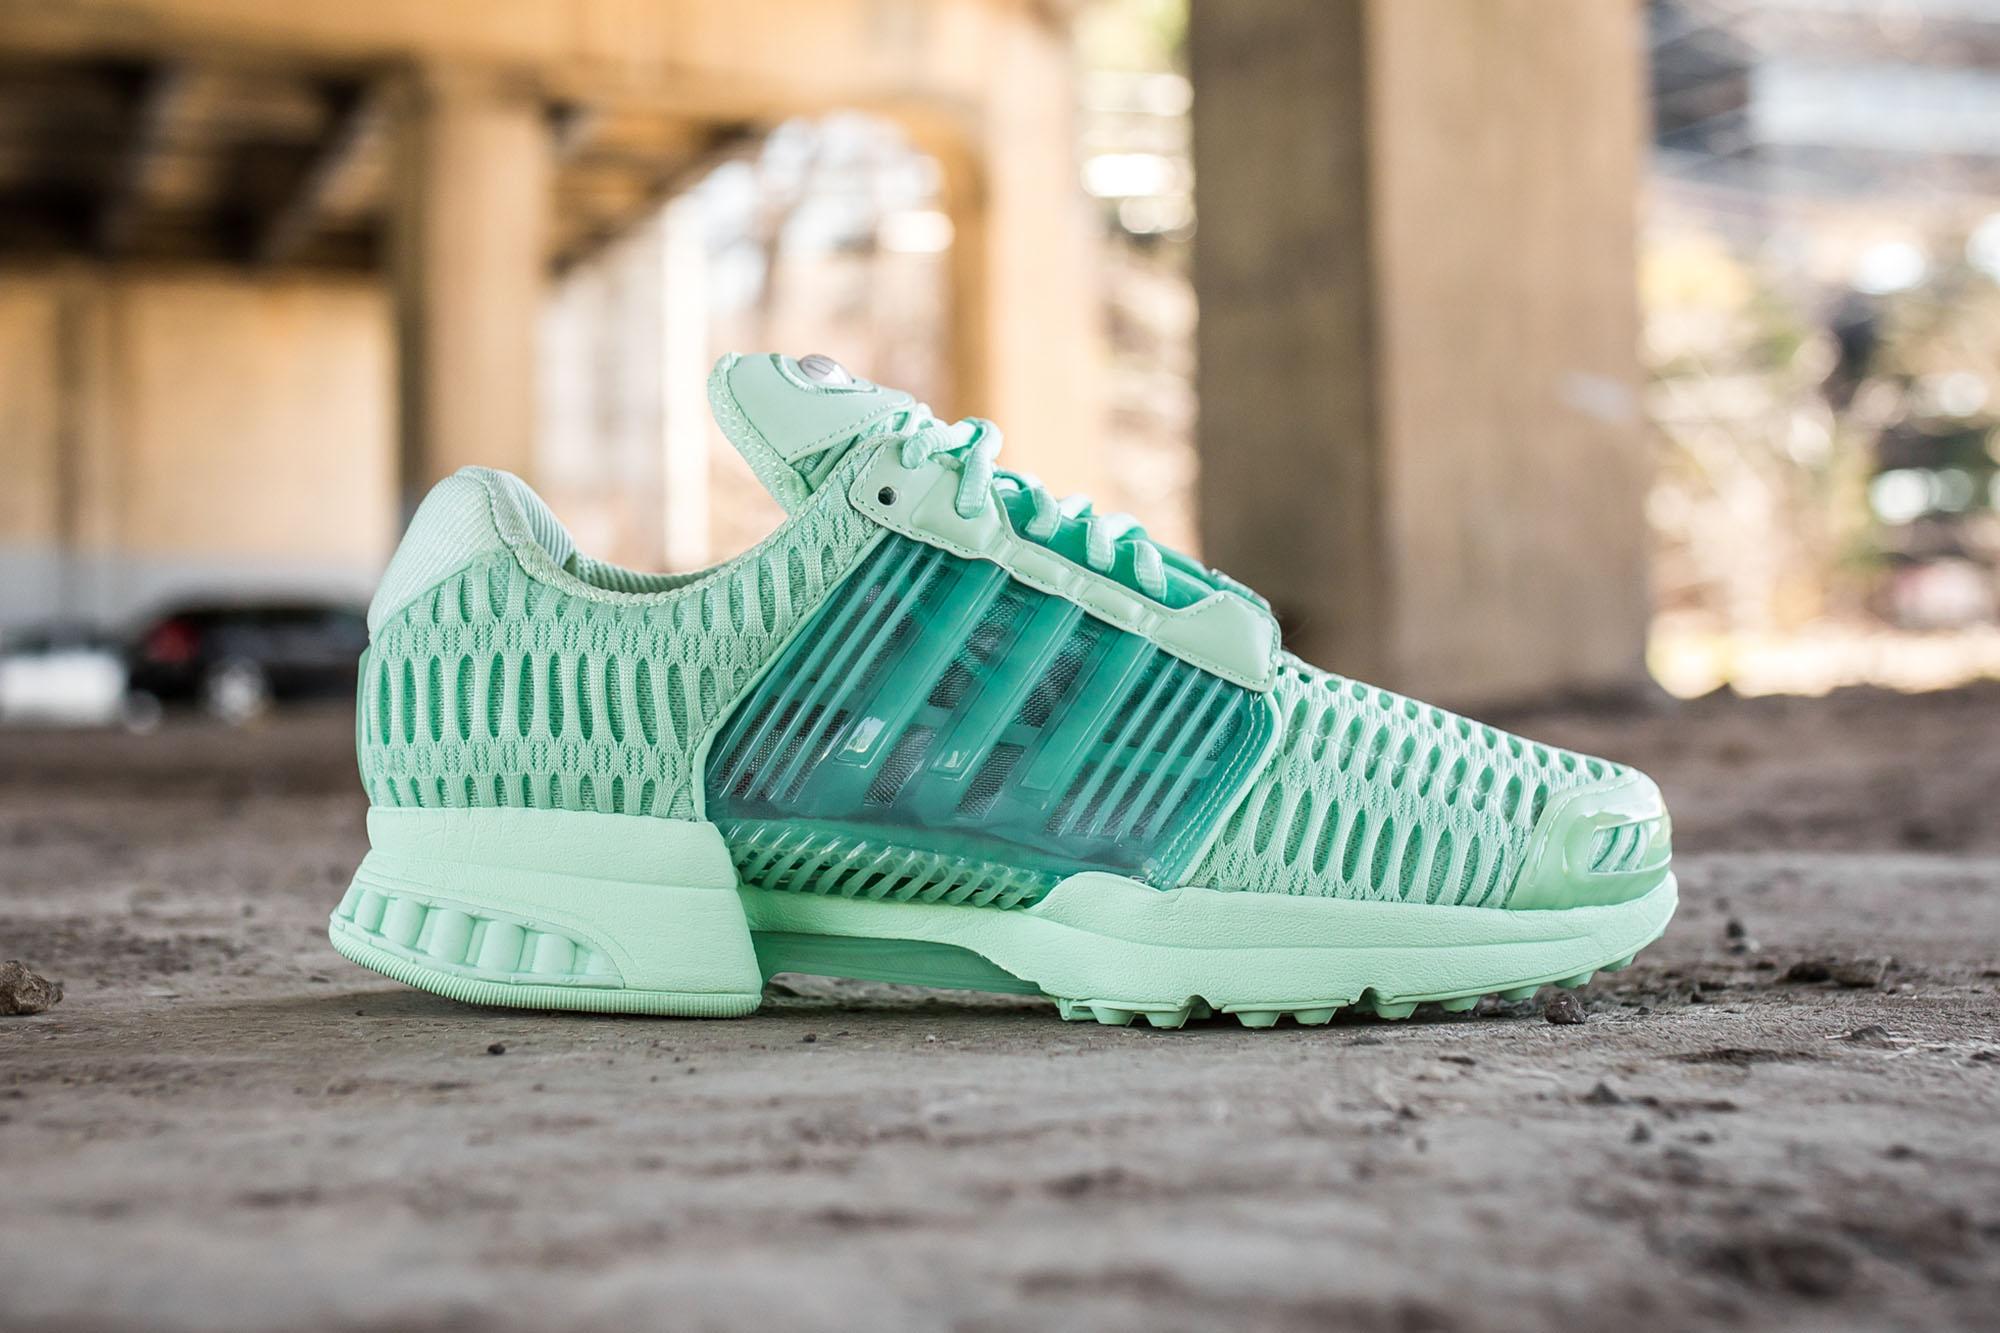 Adidas Climacool 1 On Feet